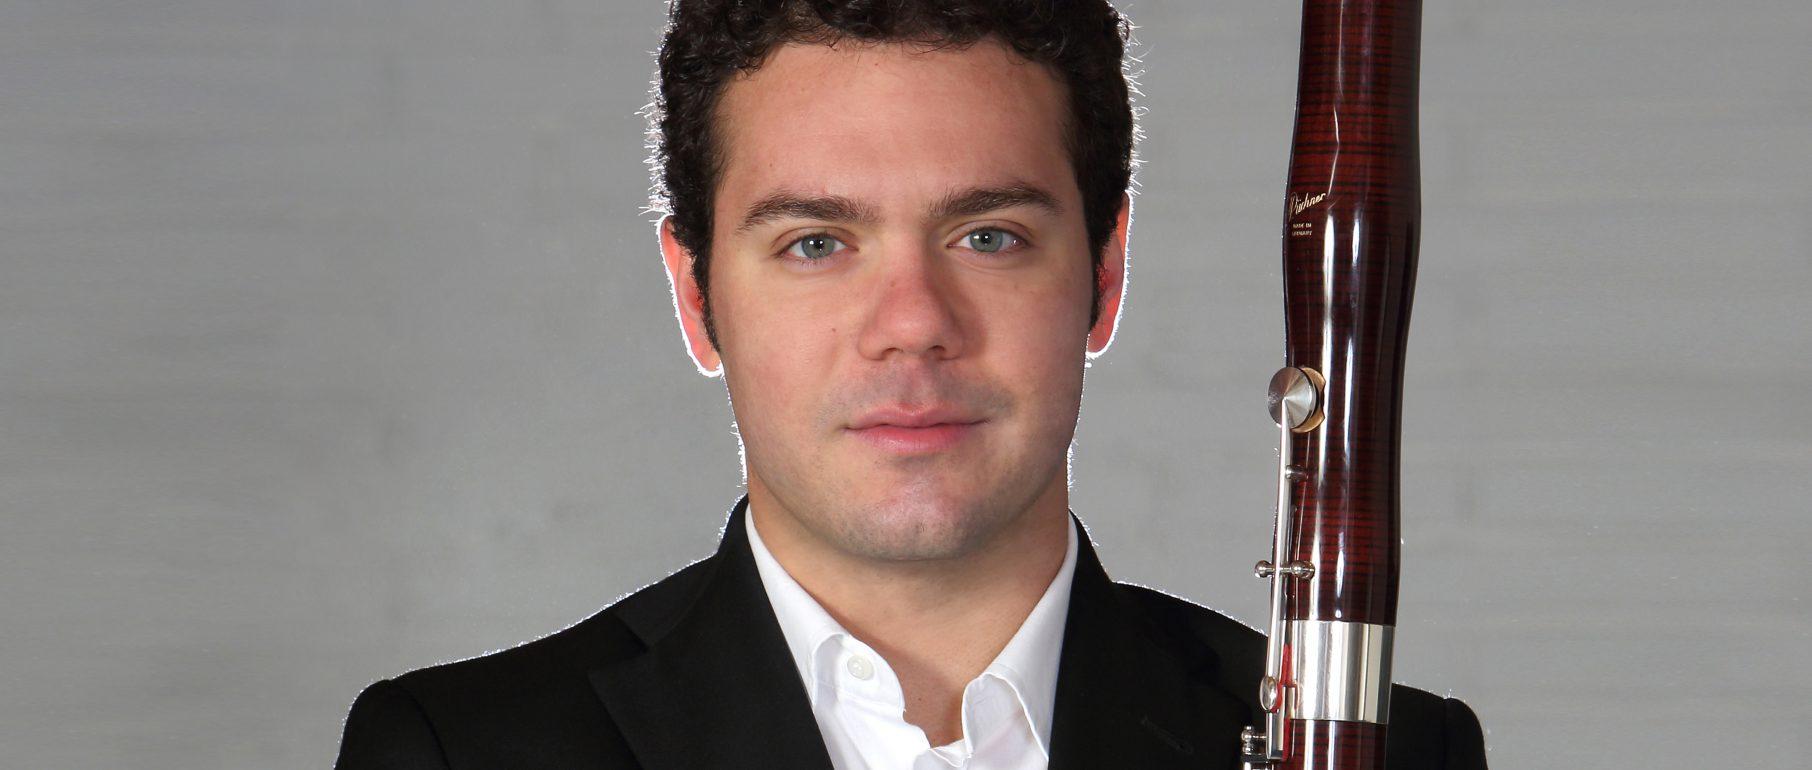 Portrait von Riccardo Terzo, Fagott